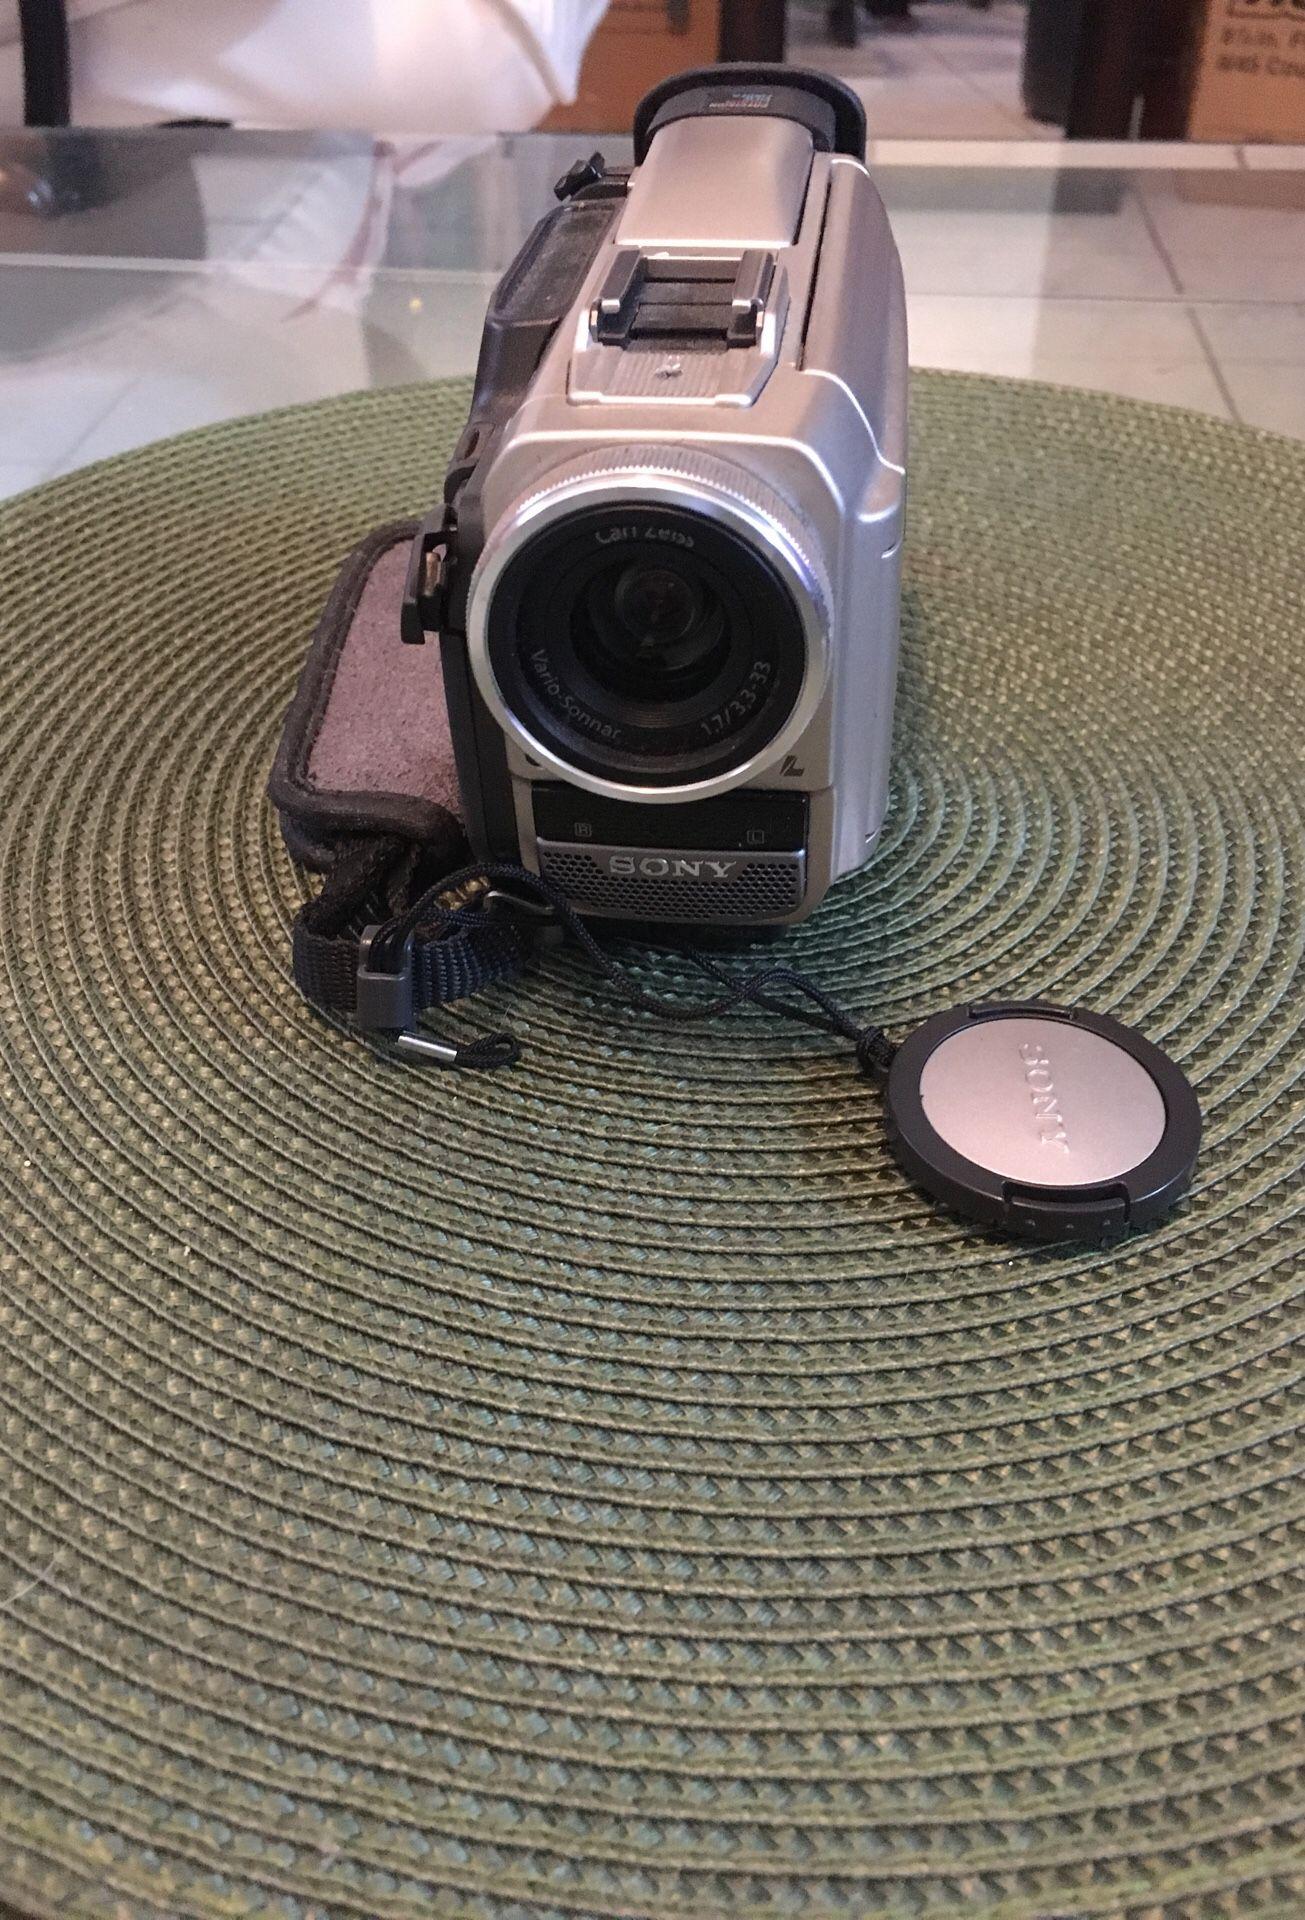 Sony N50 Digital video camera recorder